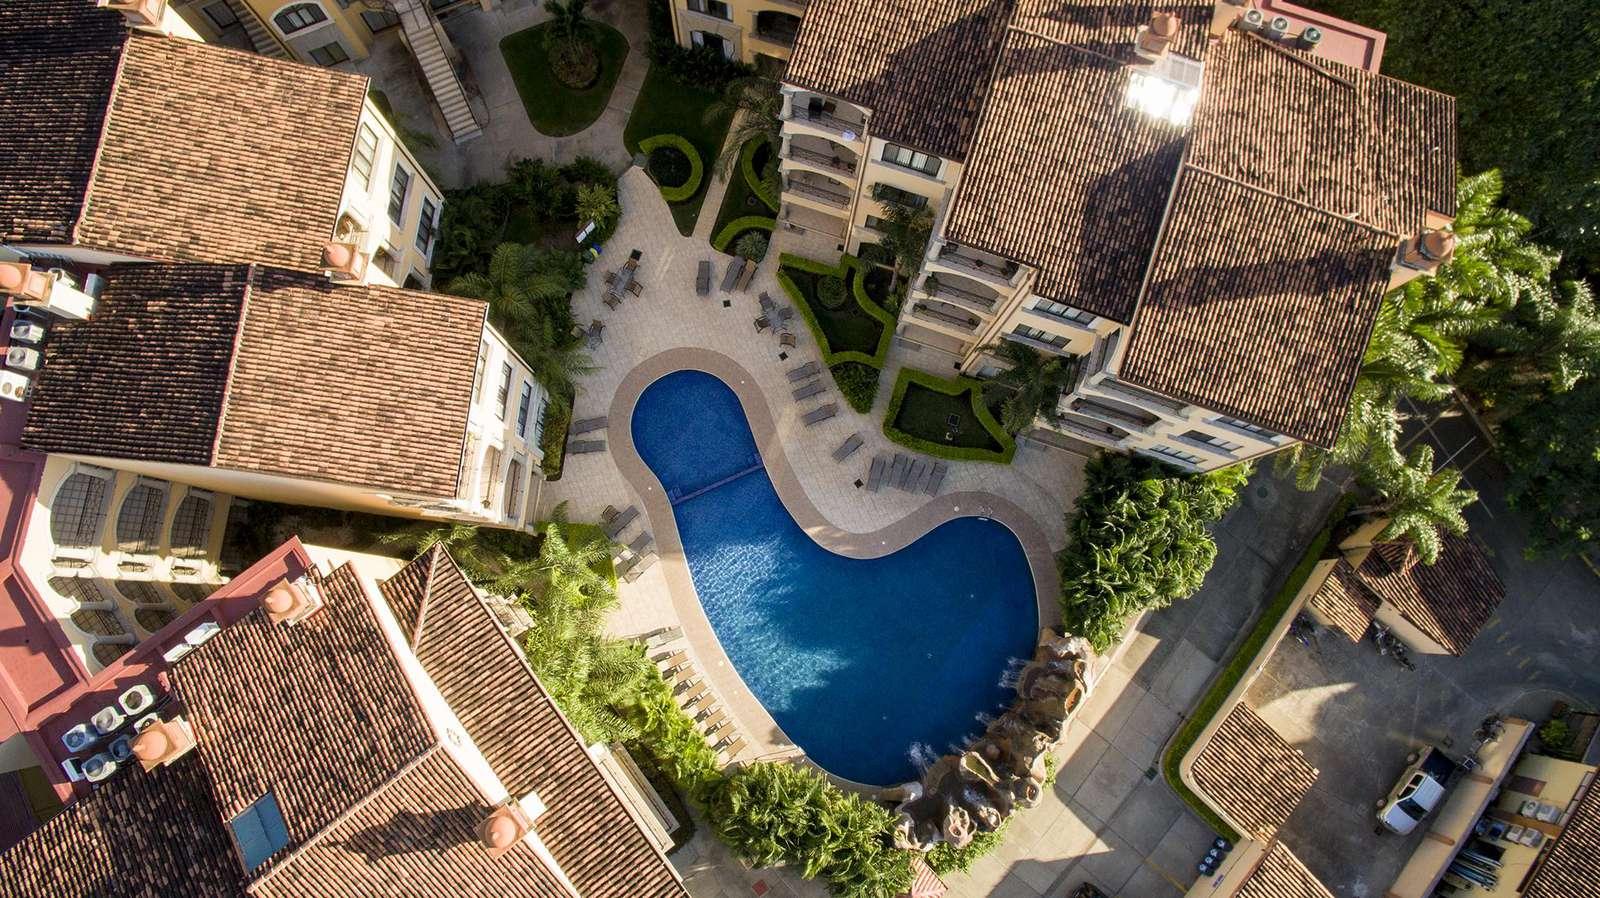 Aerial view of Sunrise resort